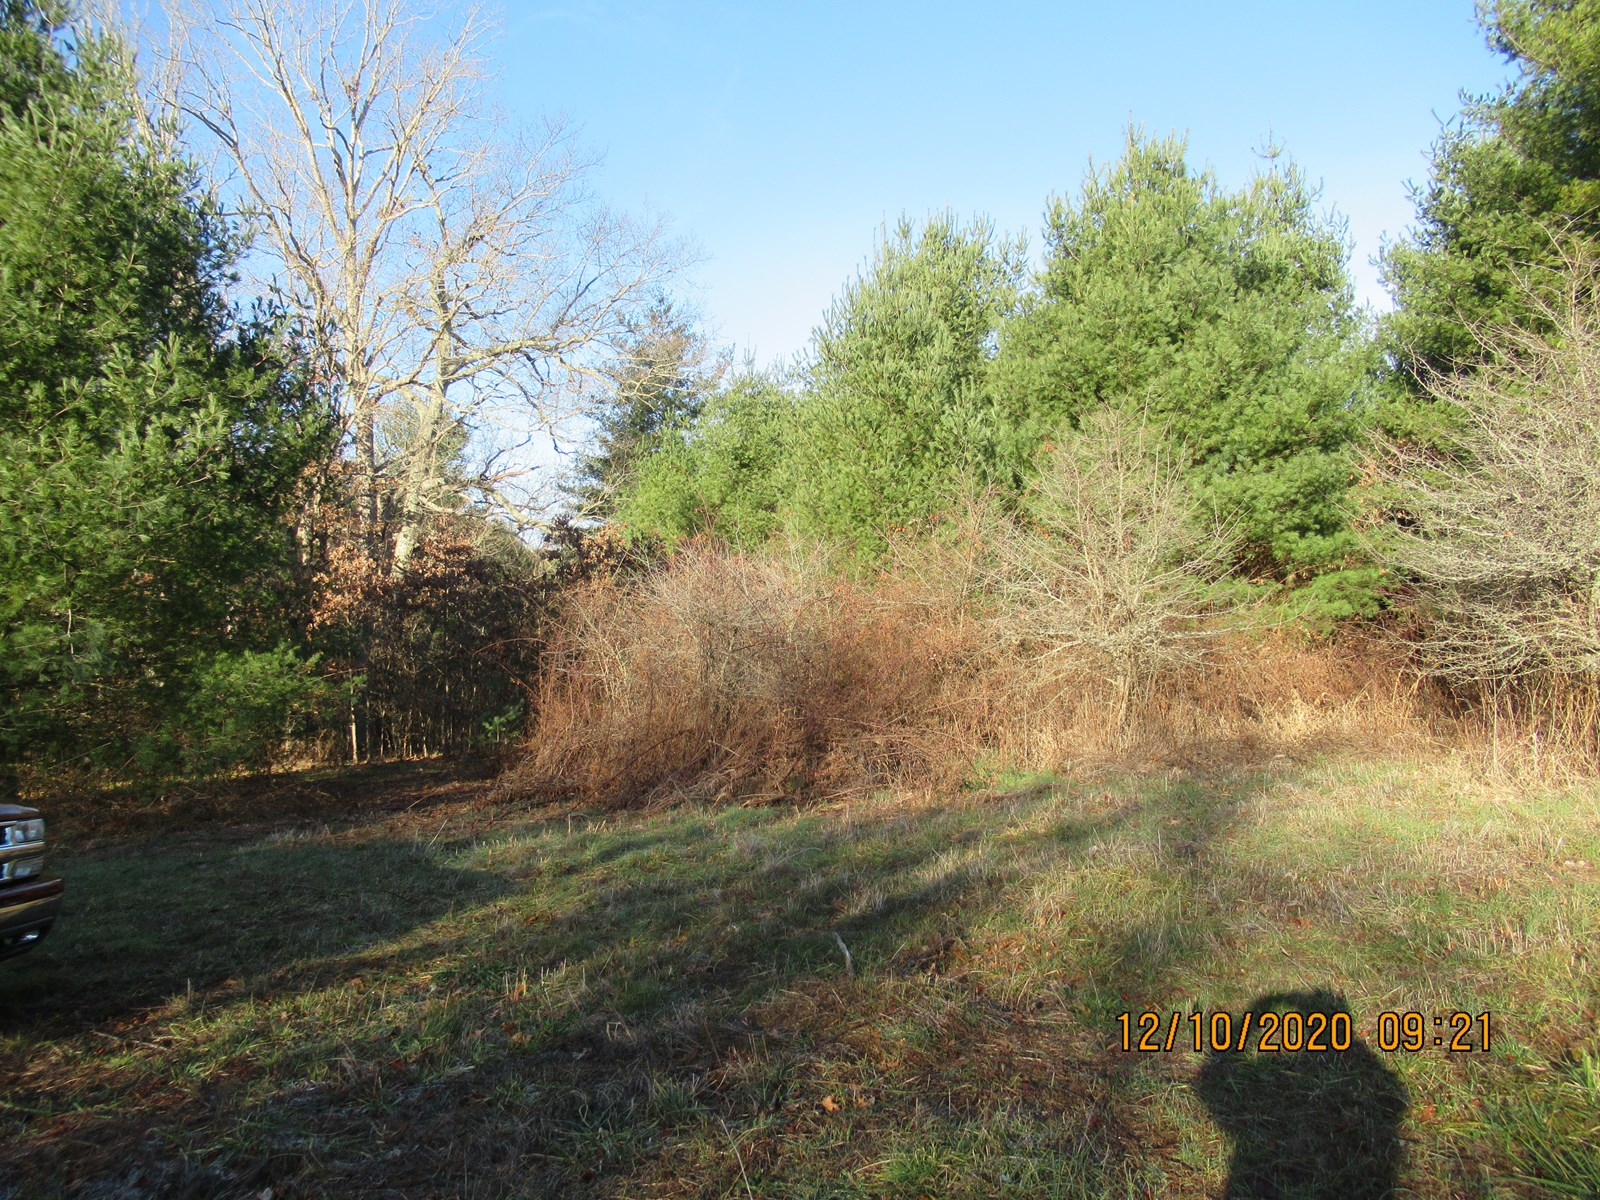 Land for Sale in Willis VA